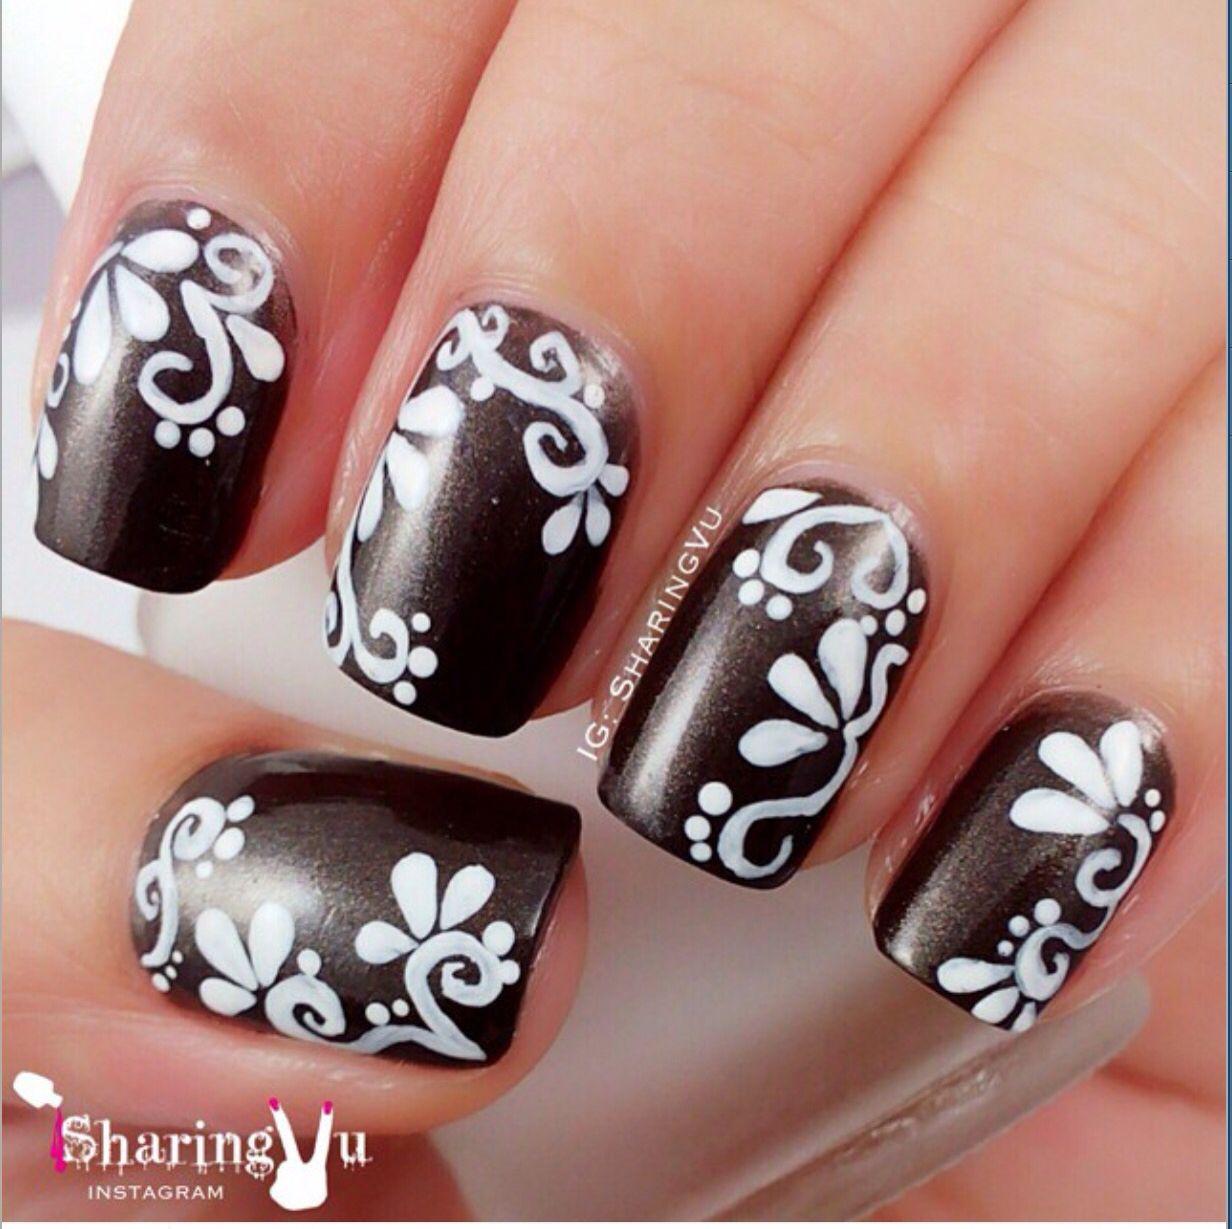 Sharingvu   Nail Art   Pinterest